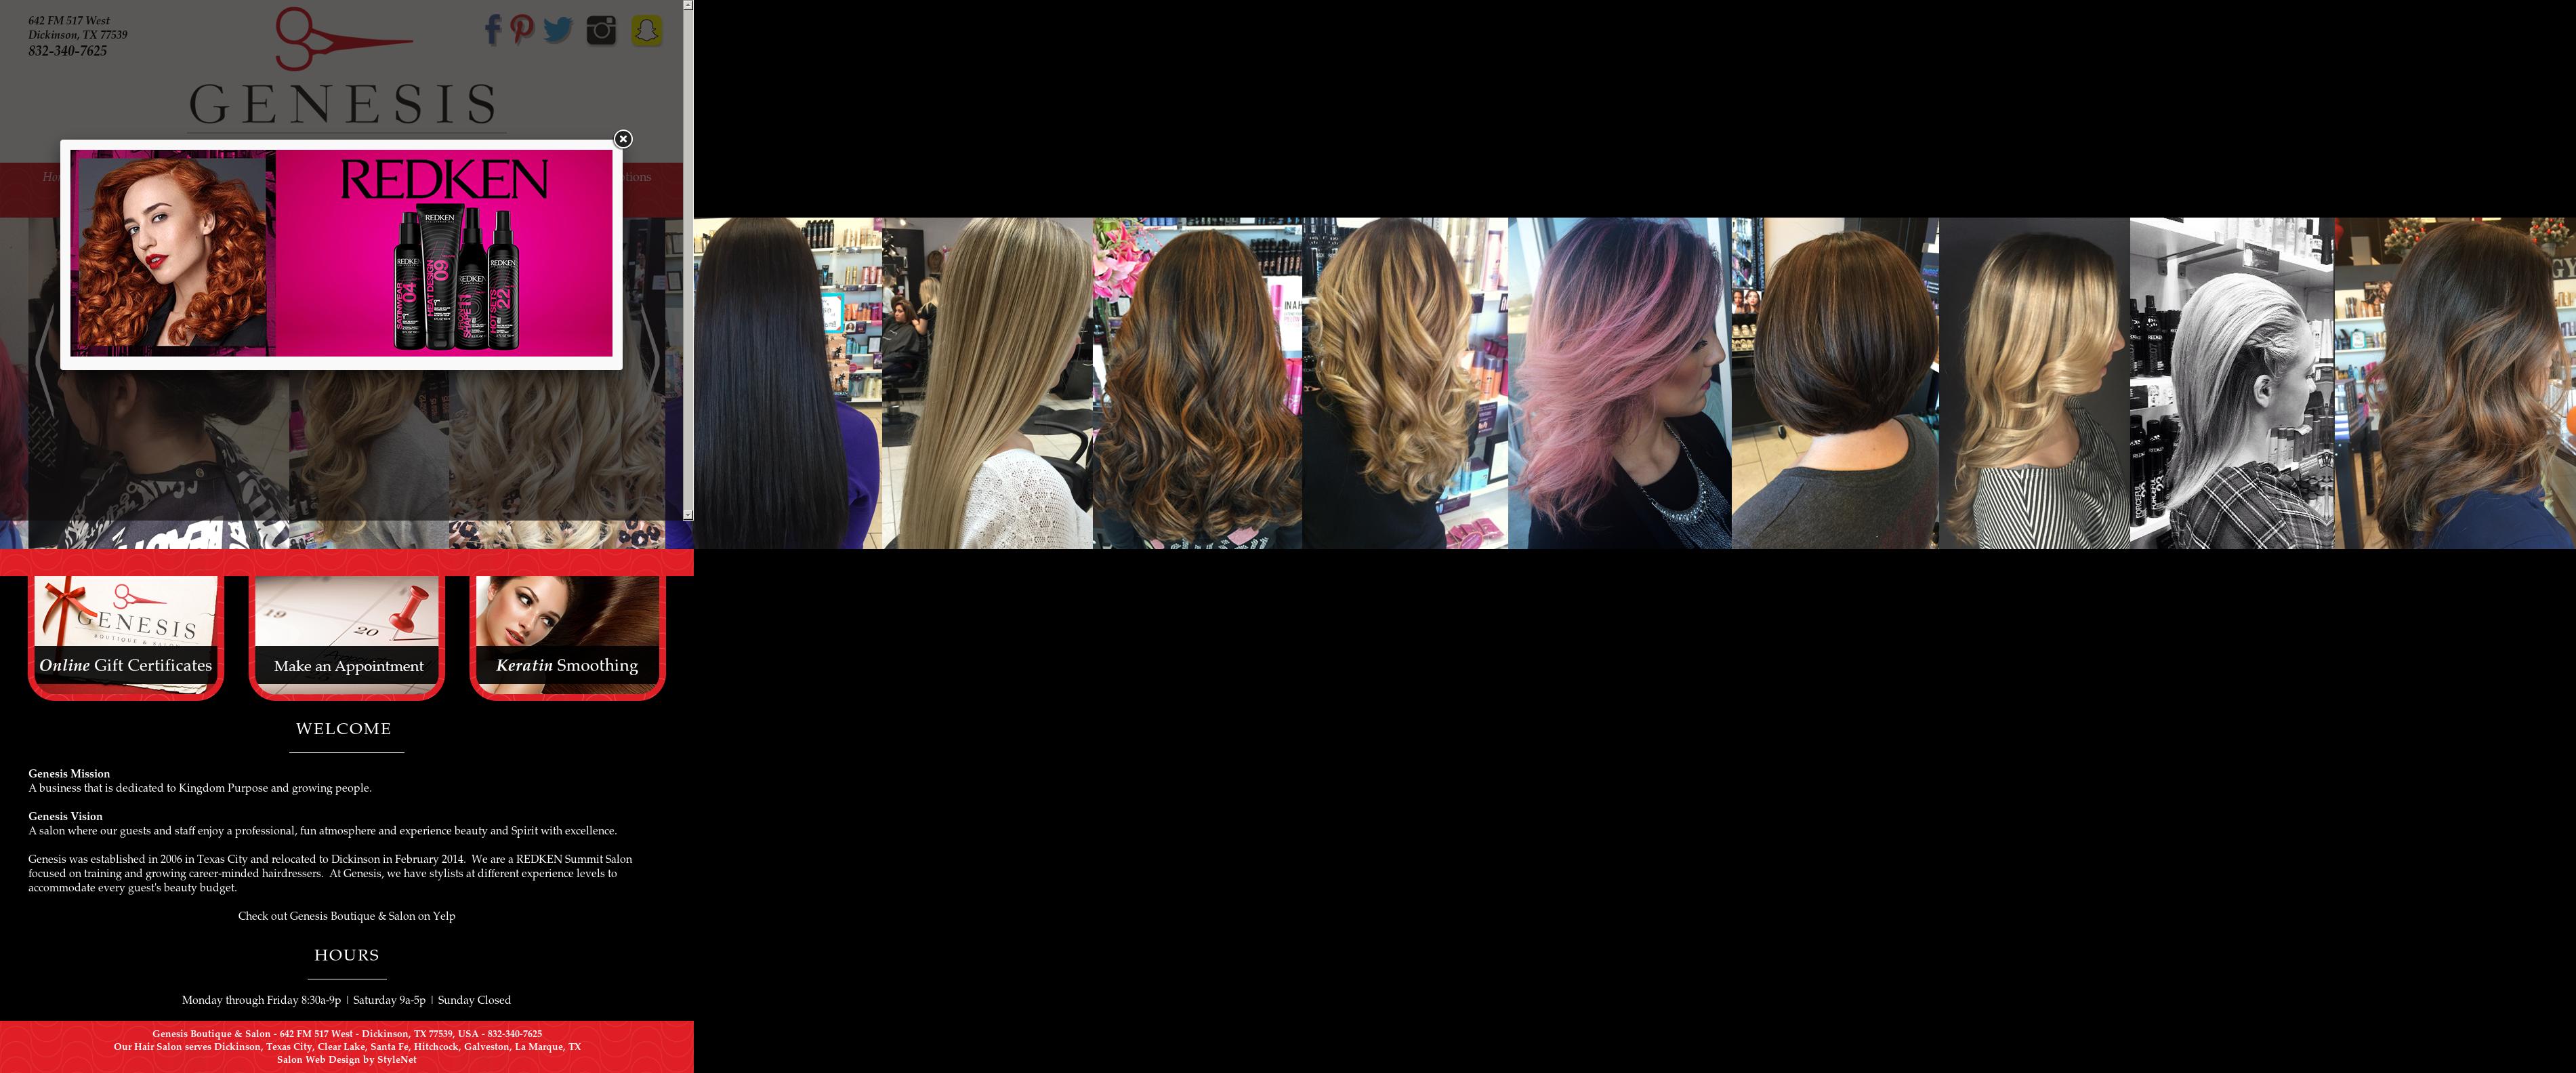 Genesis Boutique And Salon Competitors, Revenue and